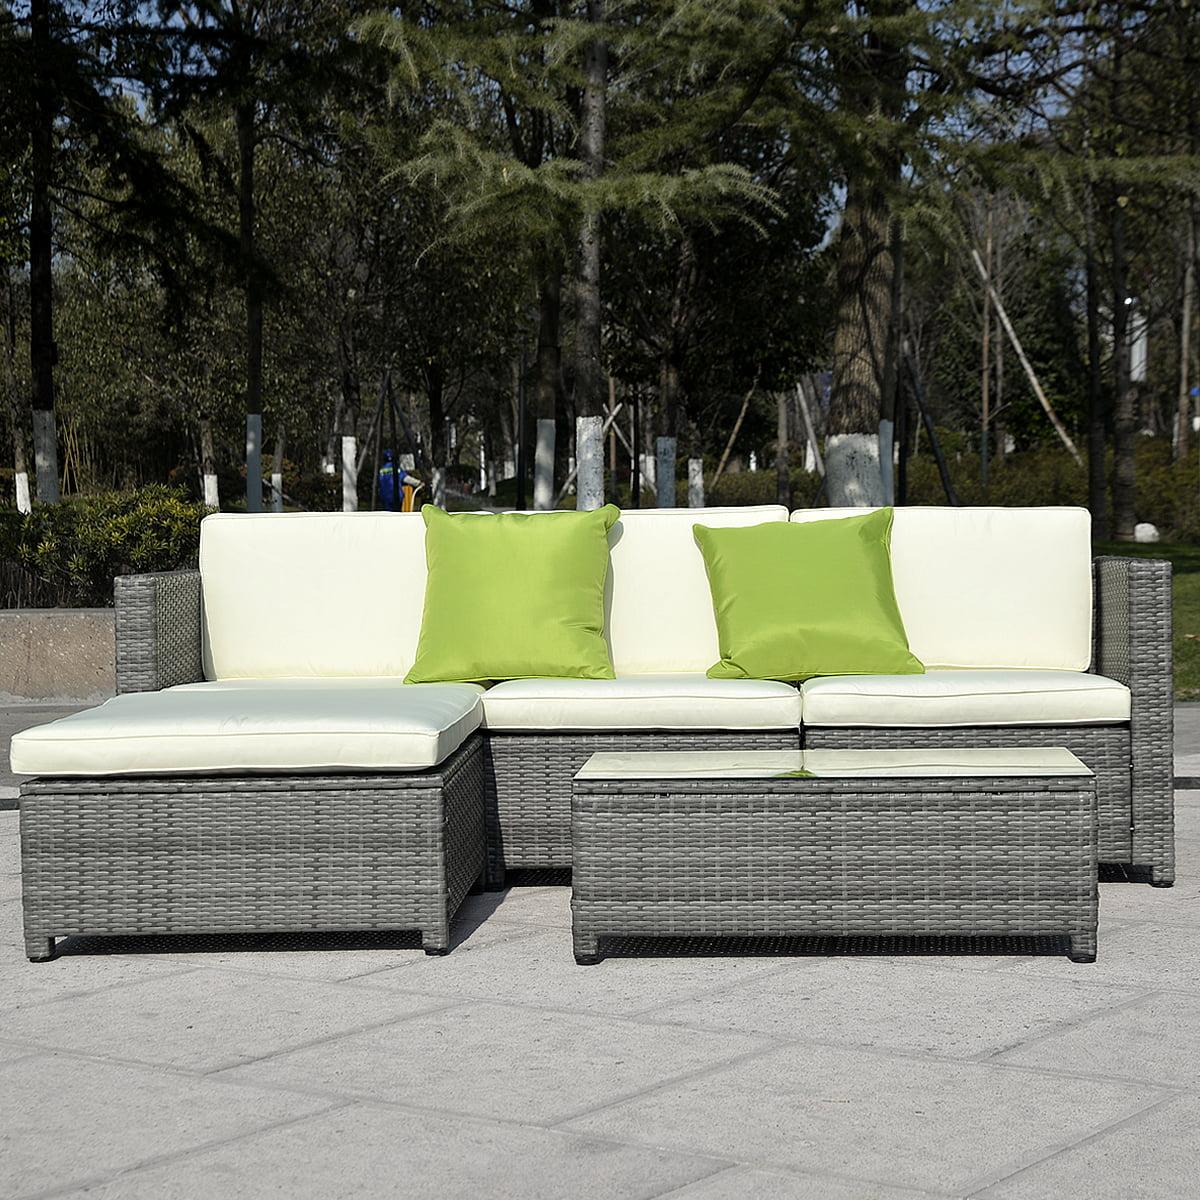 Costway 5pc Patio Rattan Wicker Sofa Set Cushioned Furniture Garden Steel Gradient Gray by Costway